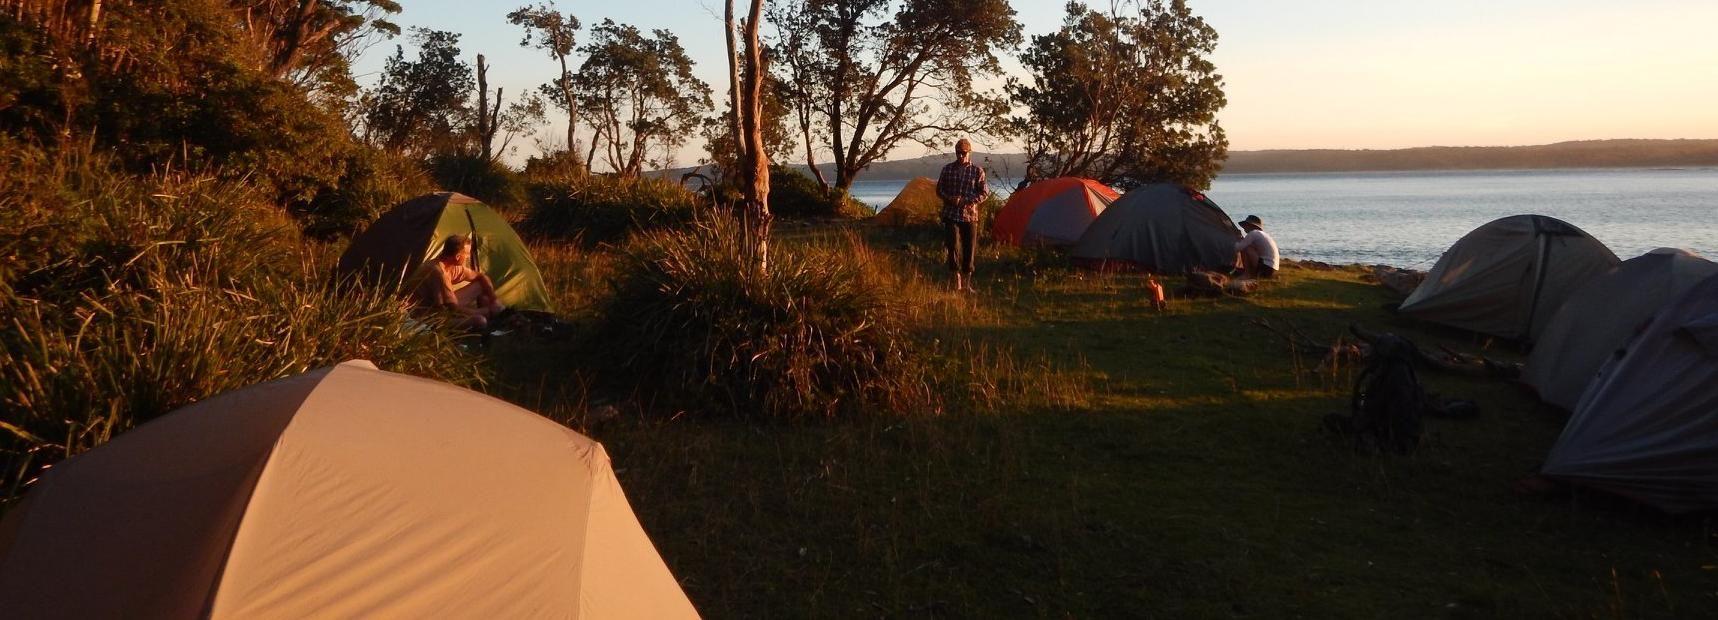 Batemans Bay: 2-Day Kayaking and Camping Adventure